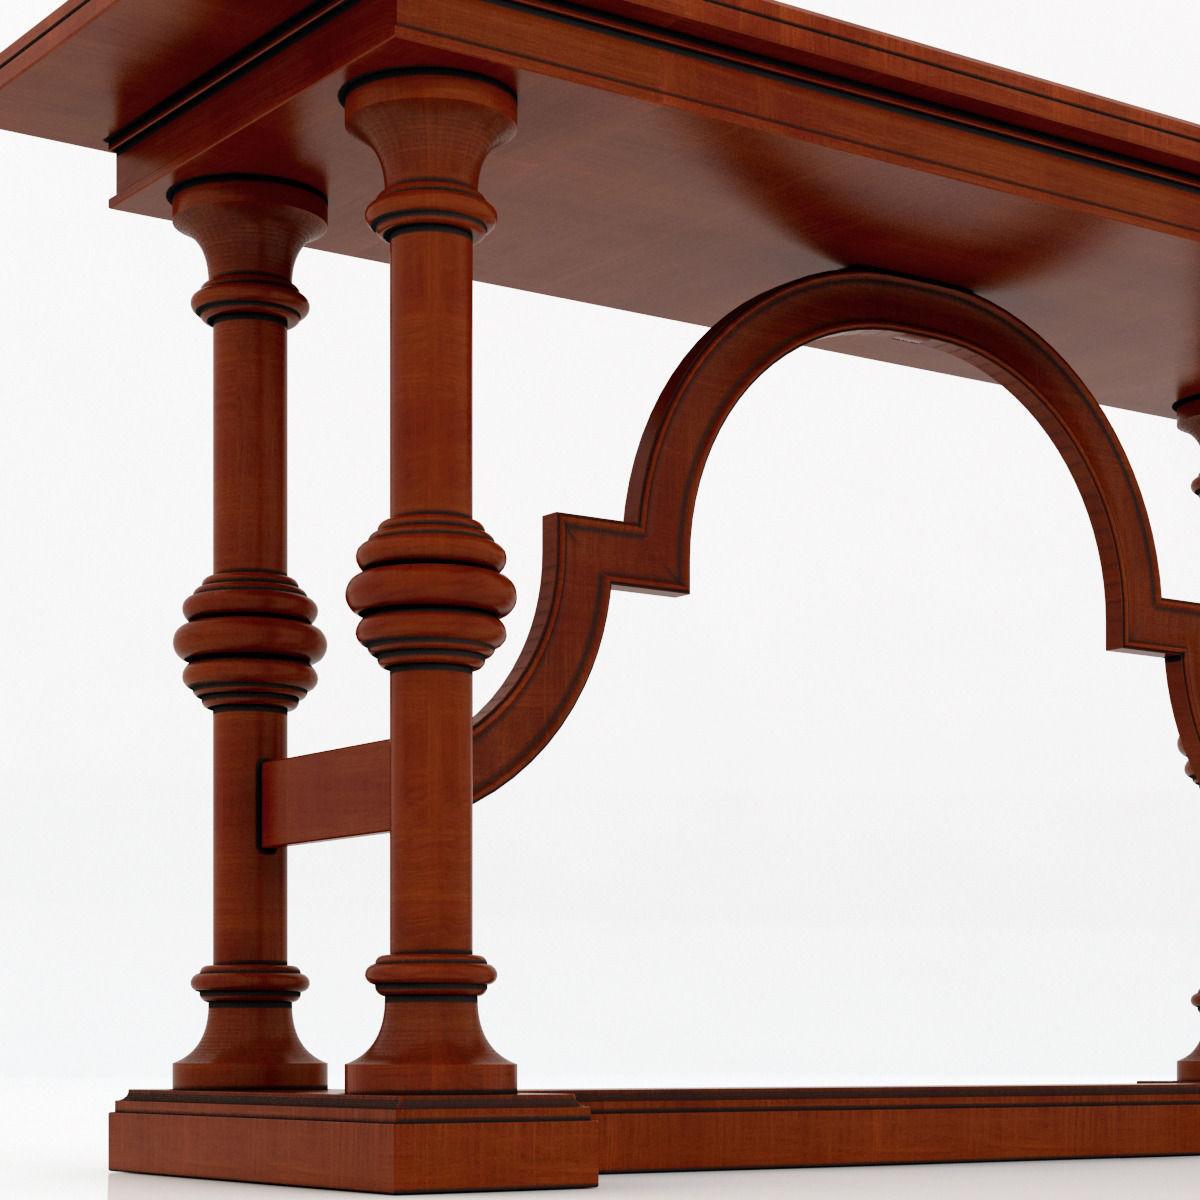 Flip Furniture Stanley Furniture The La Palma Portfolio Flip Top Console 3d Model